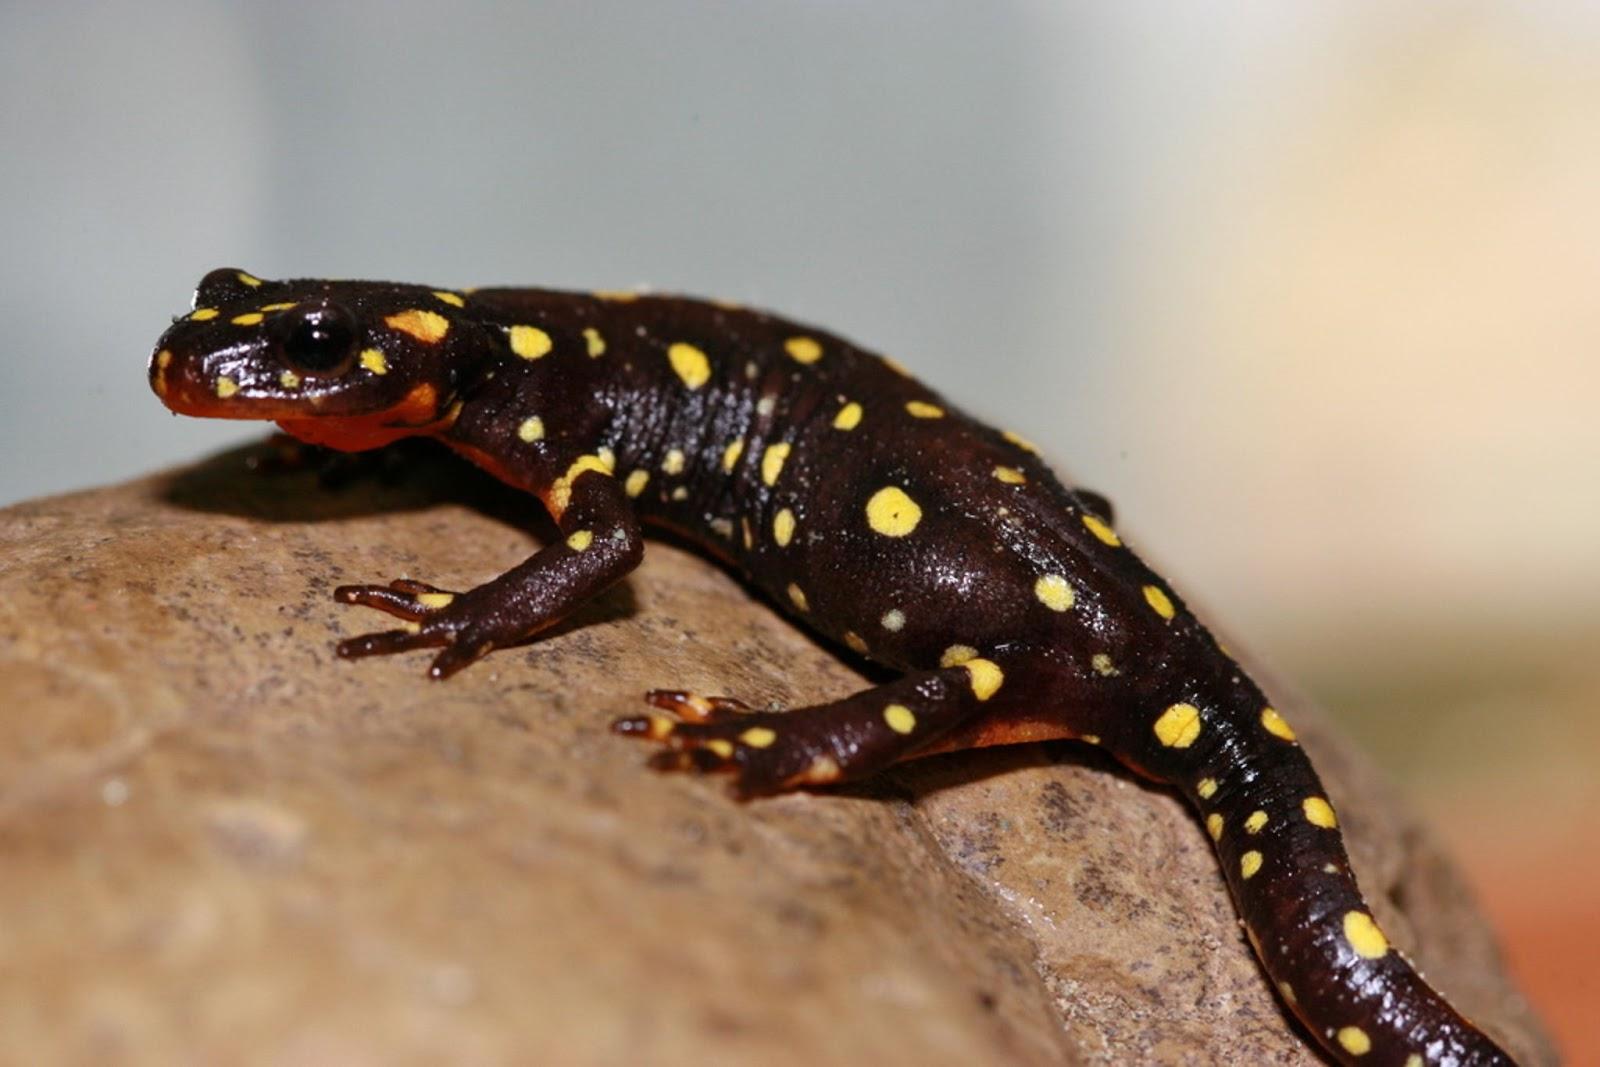 Amphibians: Kordestany Salamander (Neurergus microspilotus)